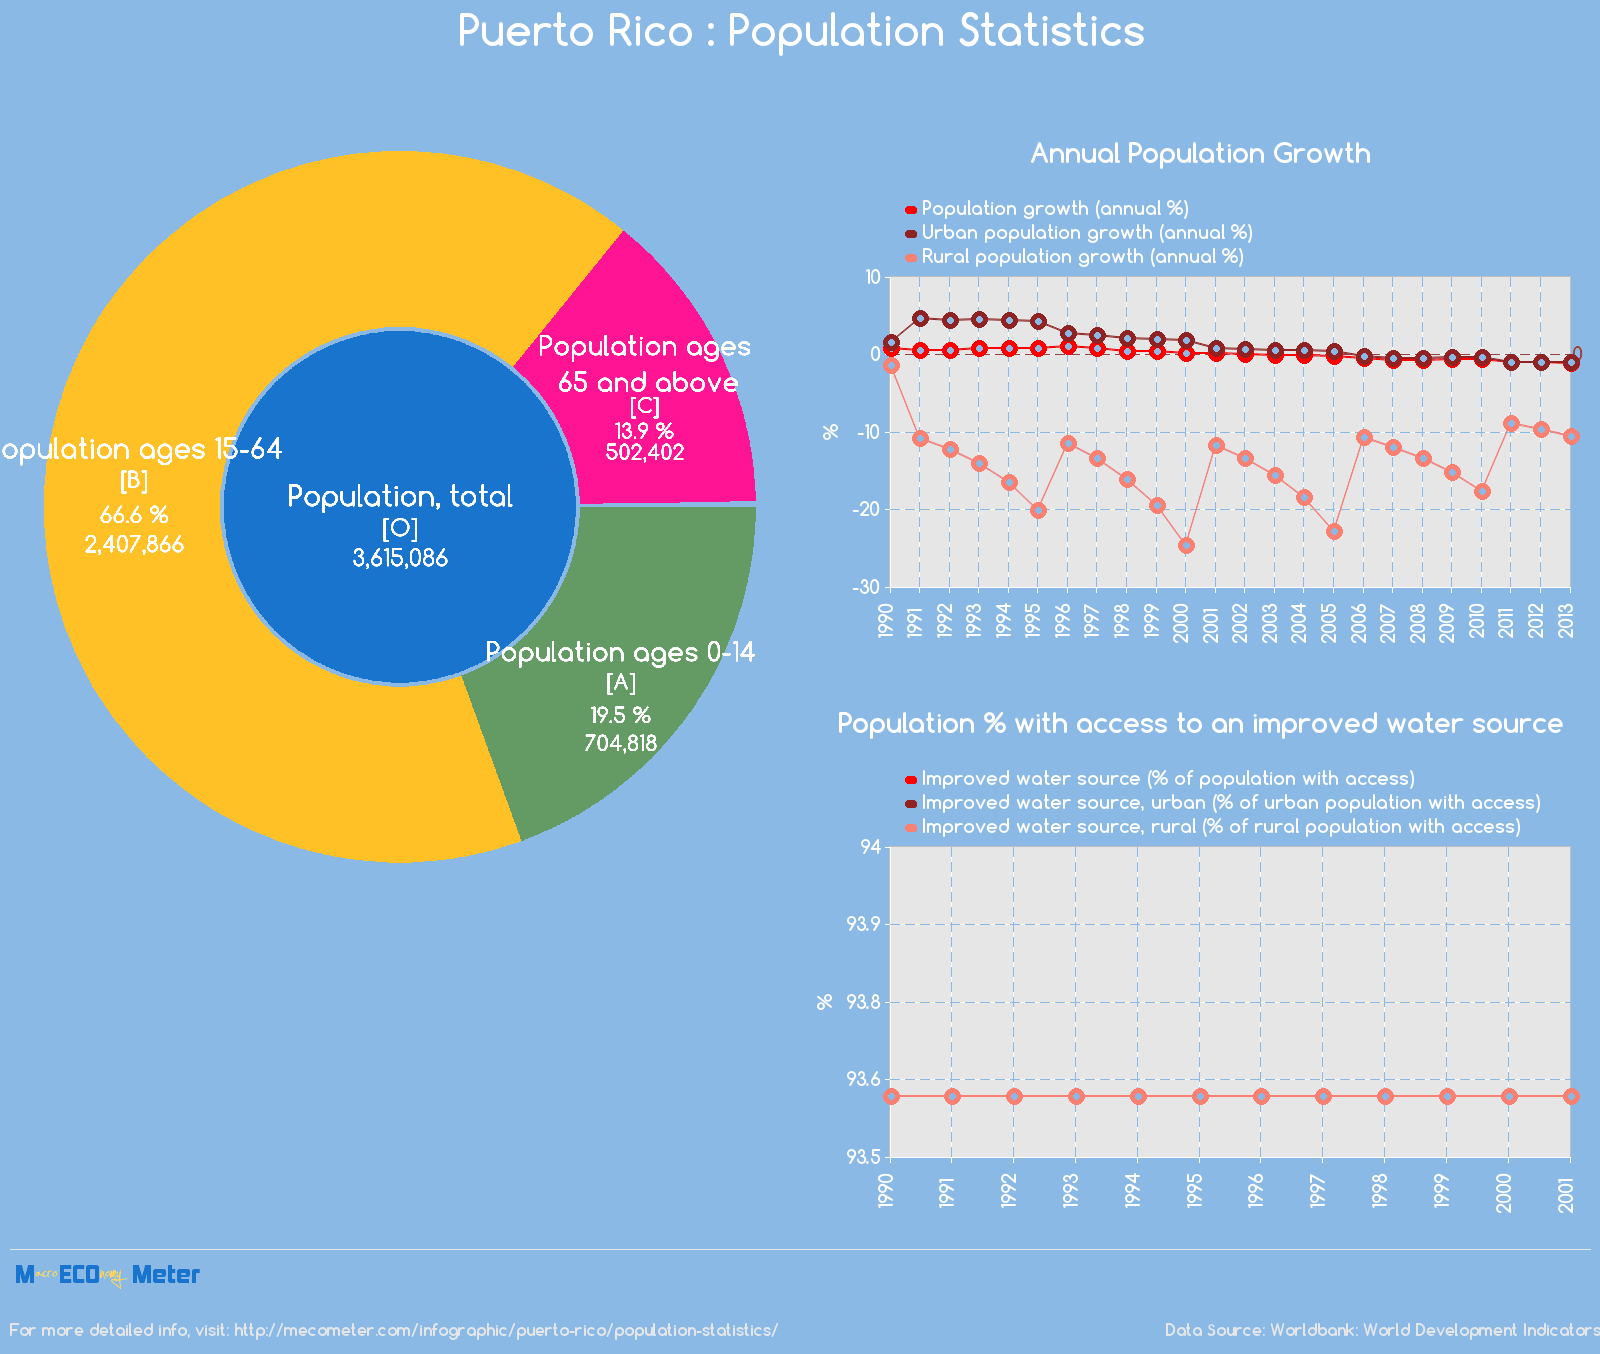 Puerto Rico : Population Statistics